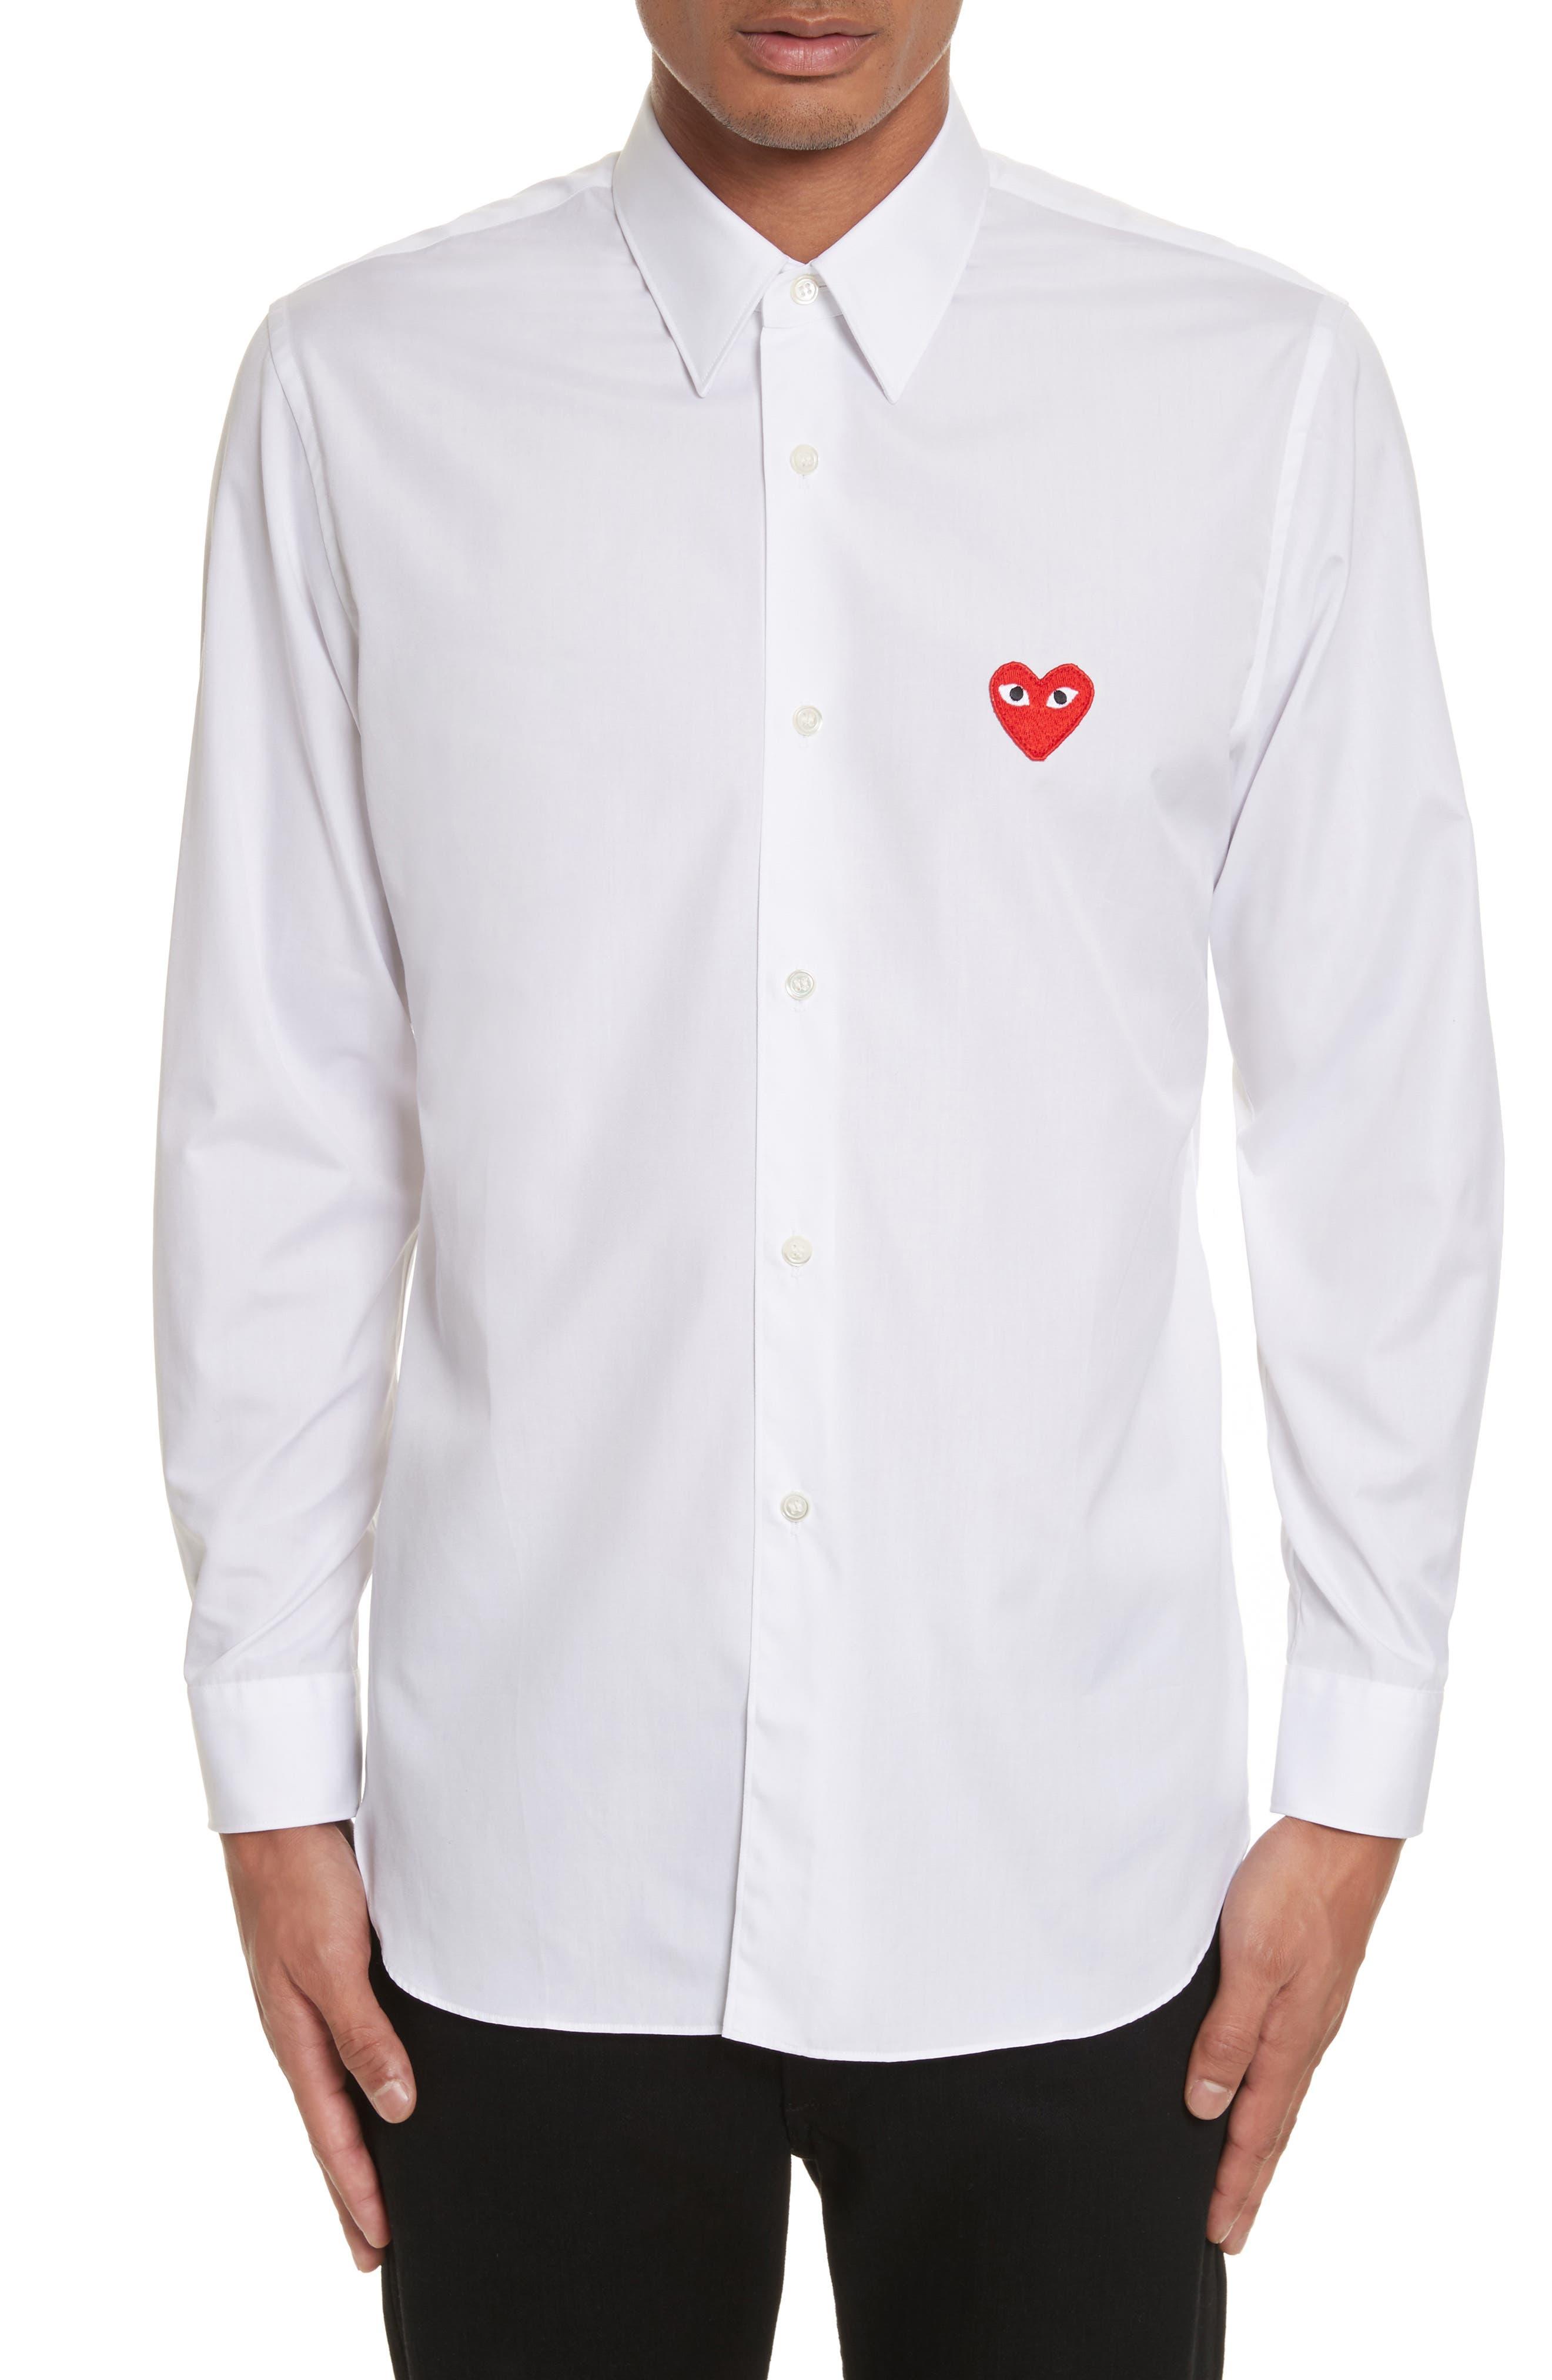 Comme des Garçons PLAY Woven Cotton Shirt